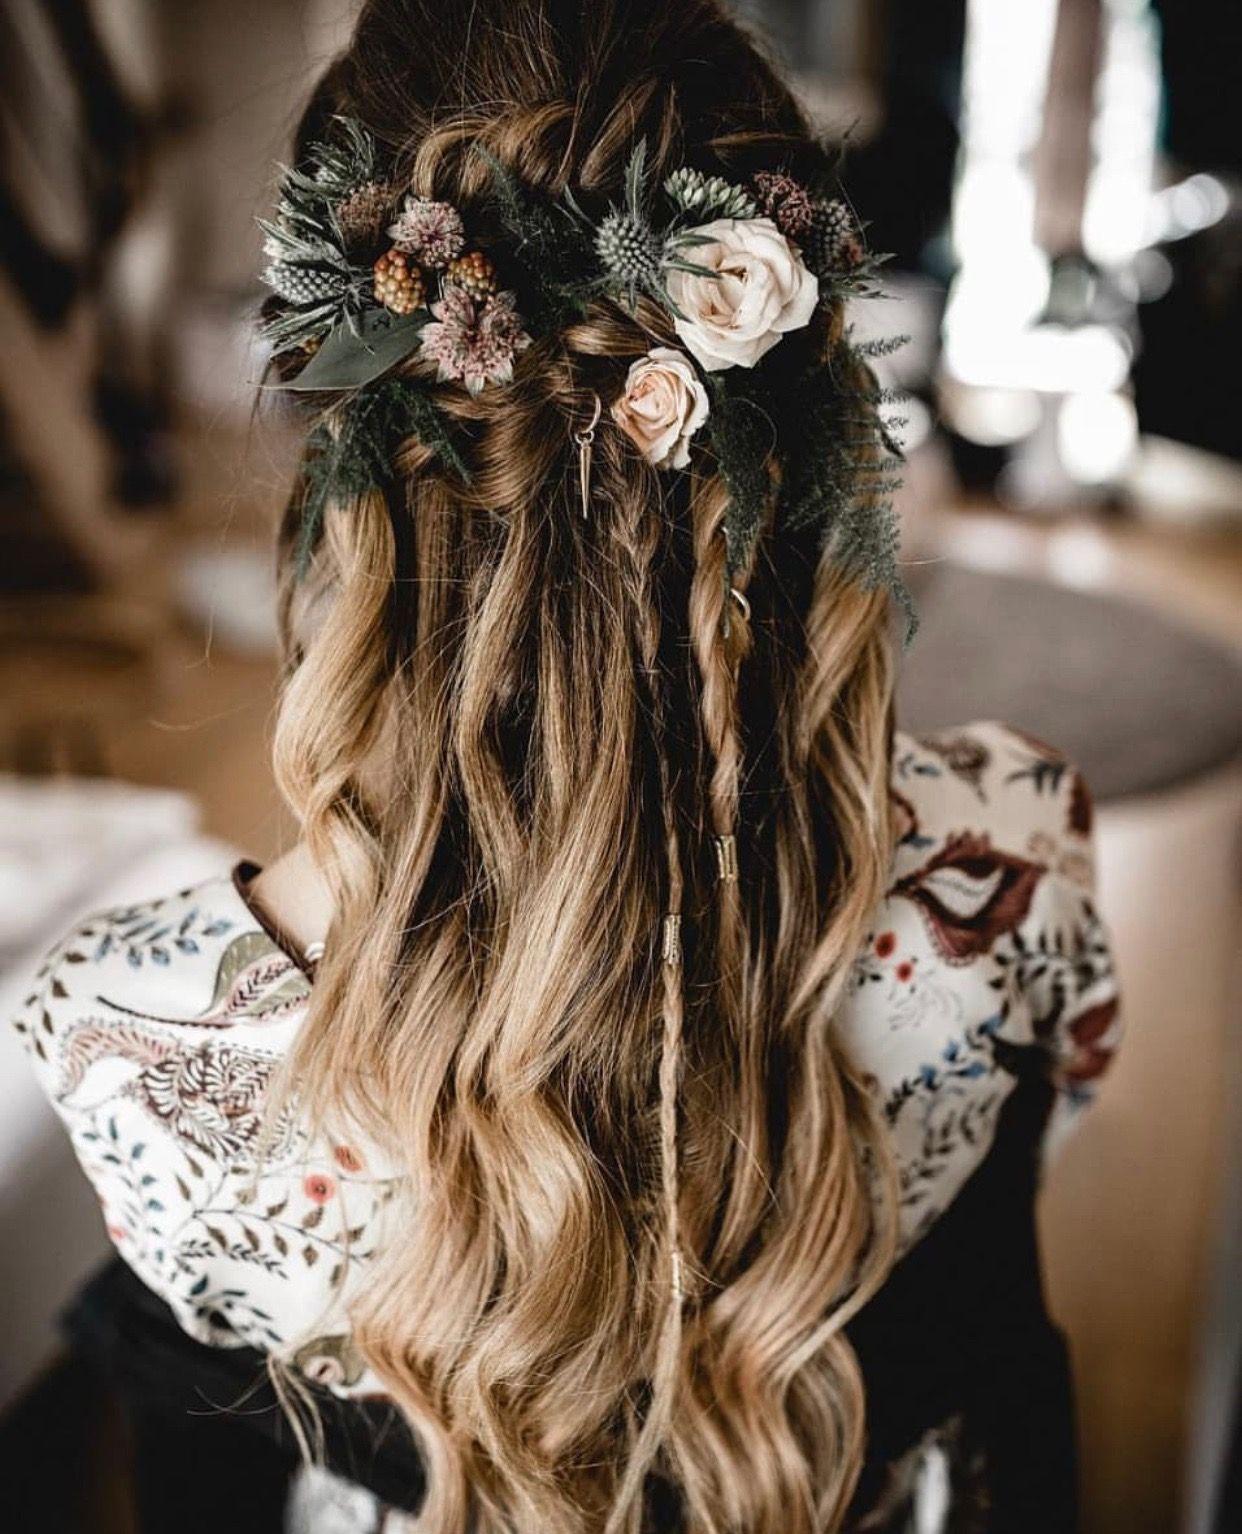 Pin By Whitley K On Floral Headpiece Bohemian Wedding Hair Braided Hairstyles For Wedding Wedding Hair Half